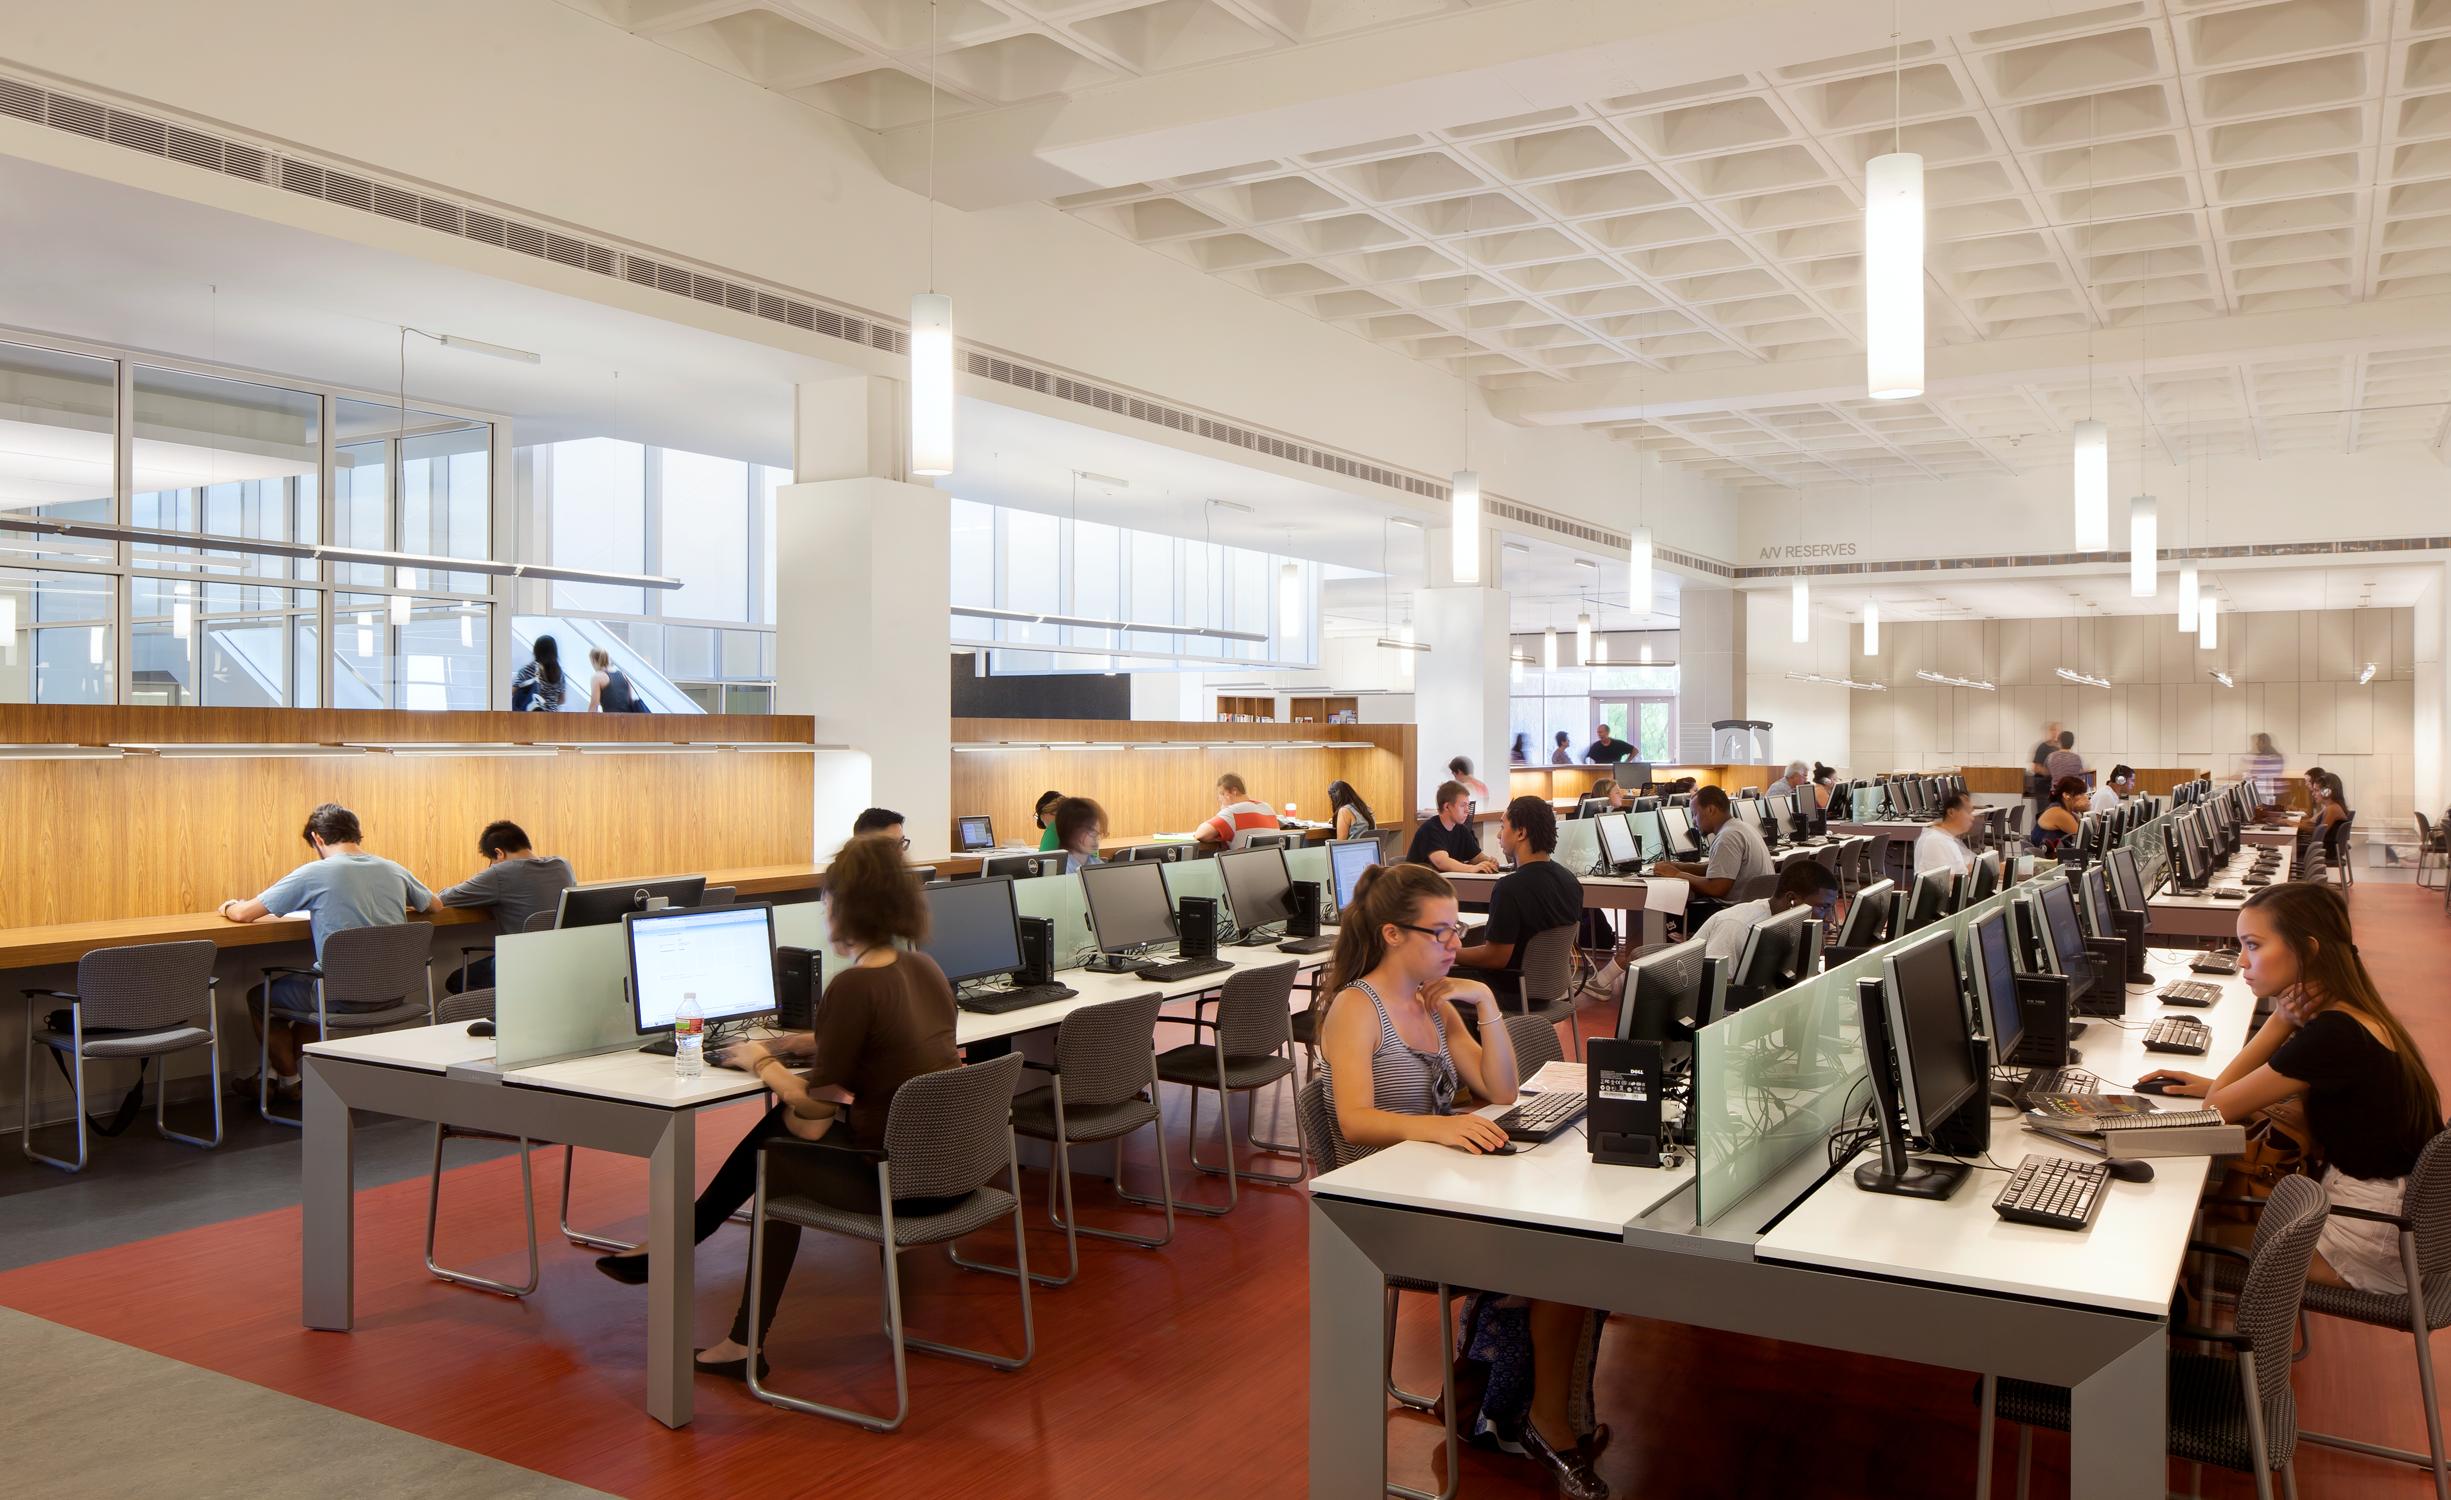 Saddleback College Library